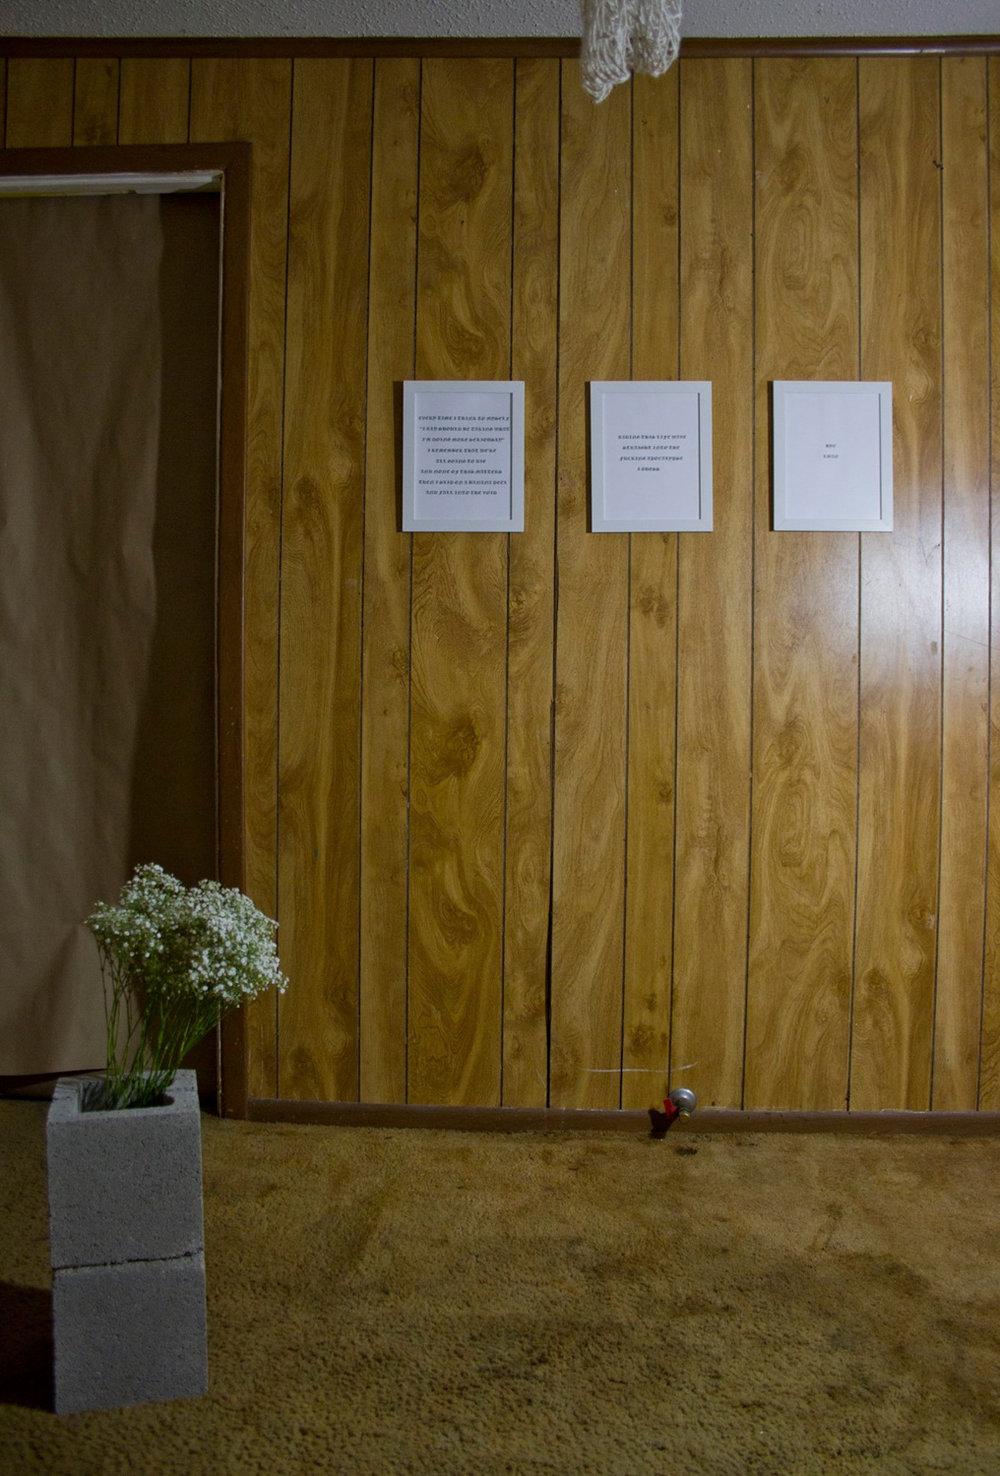 The Gimp Room